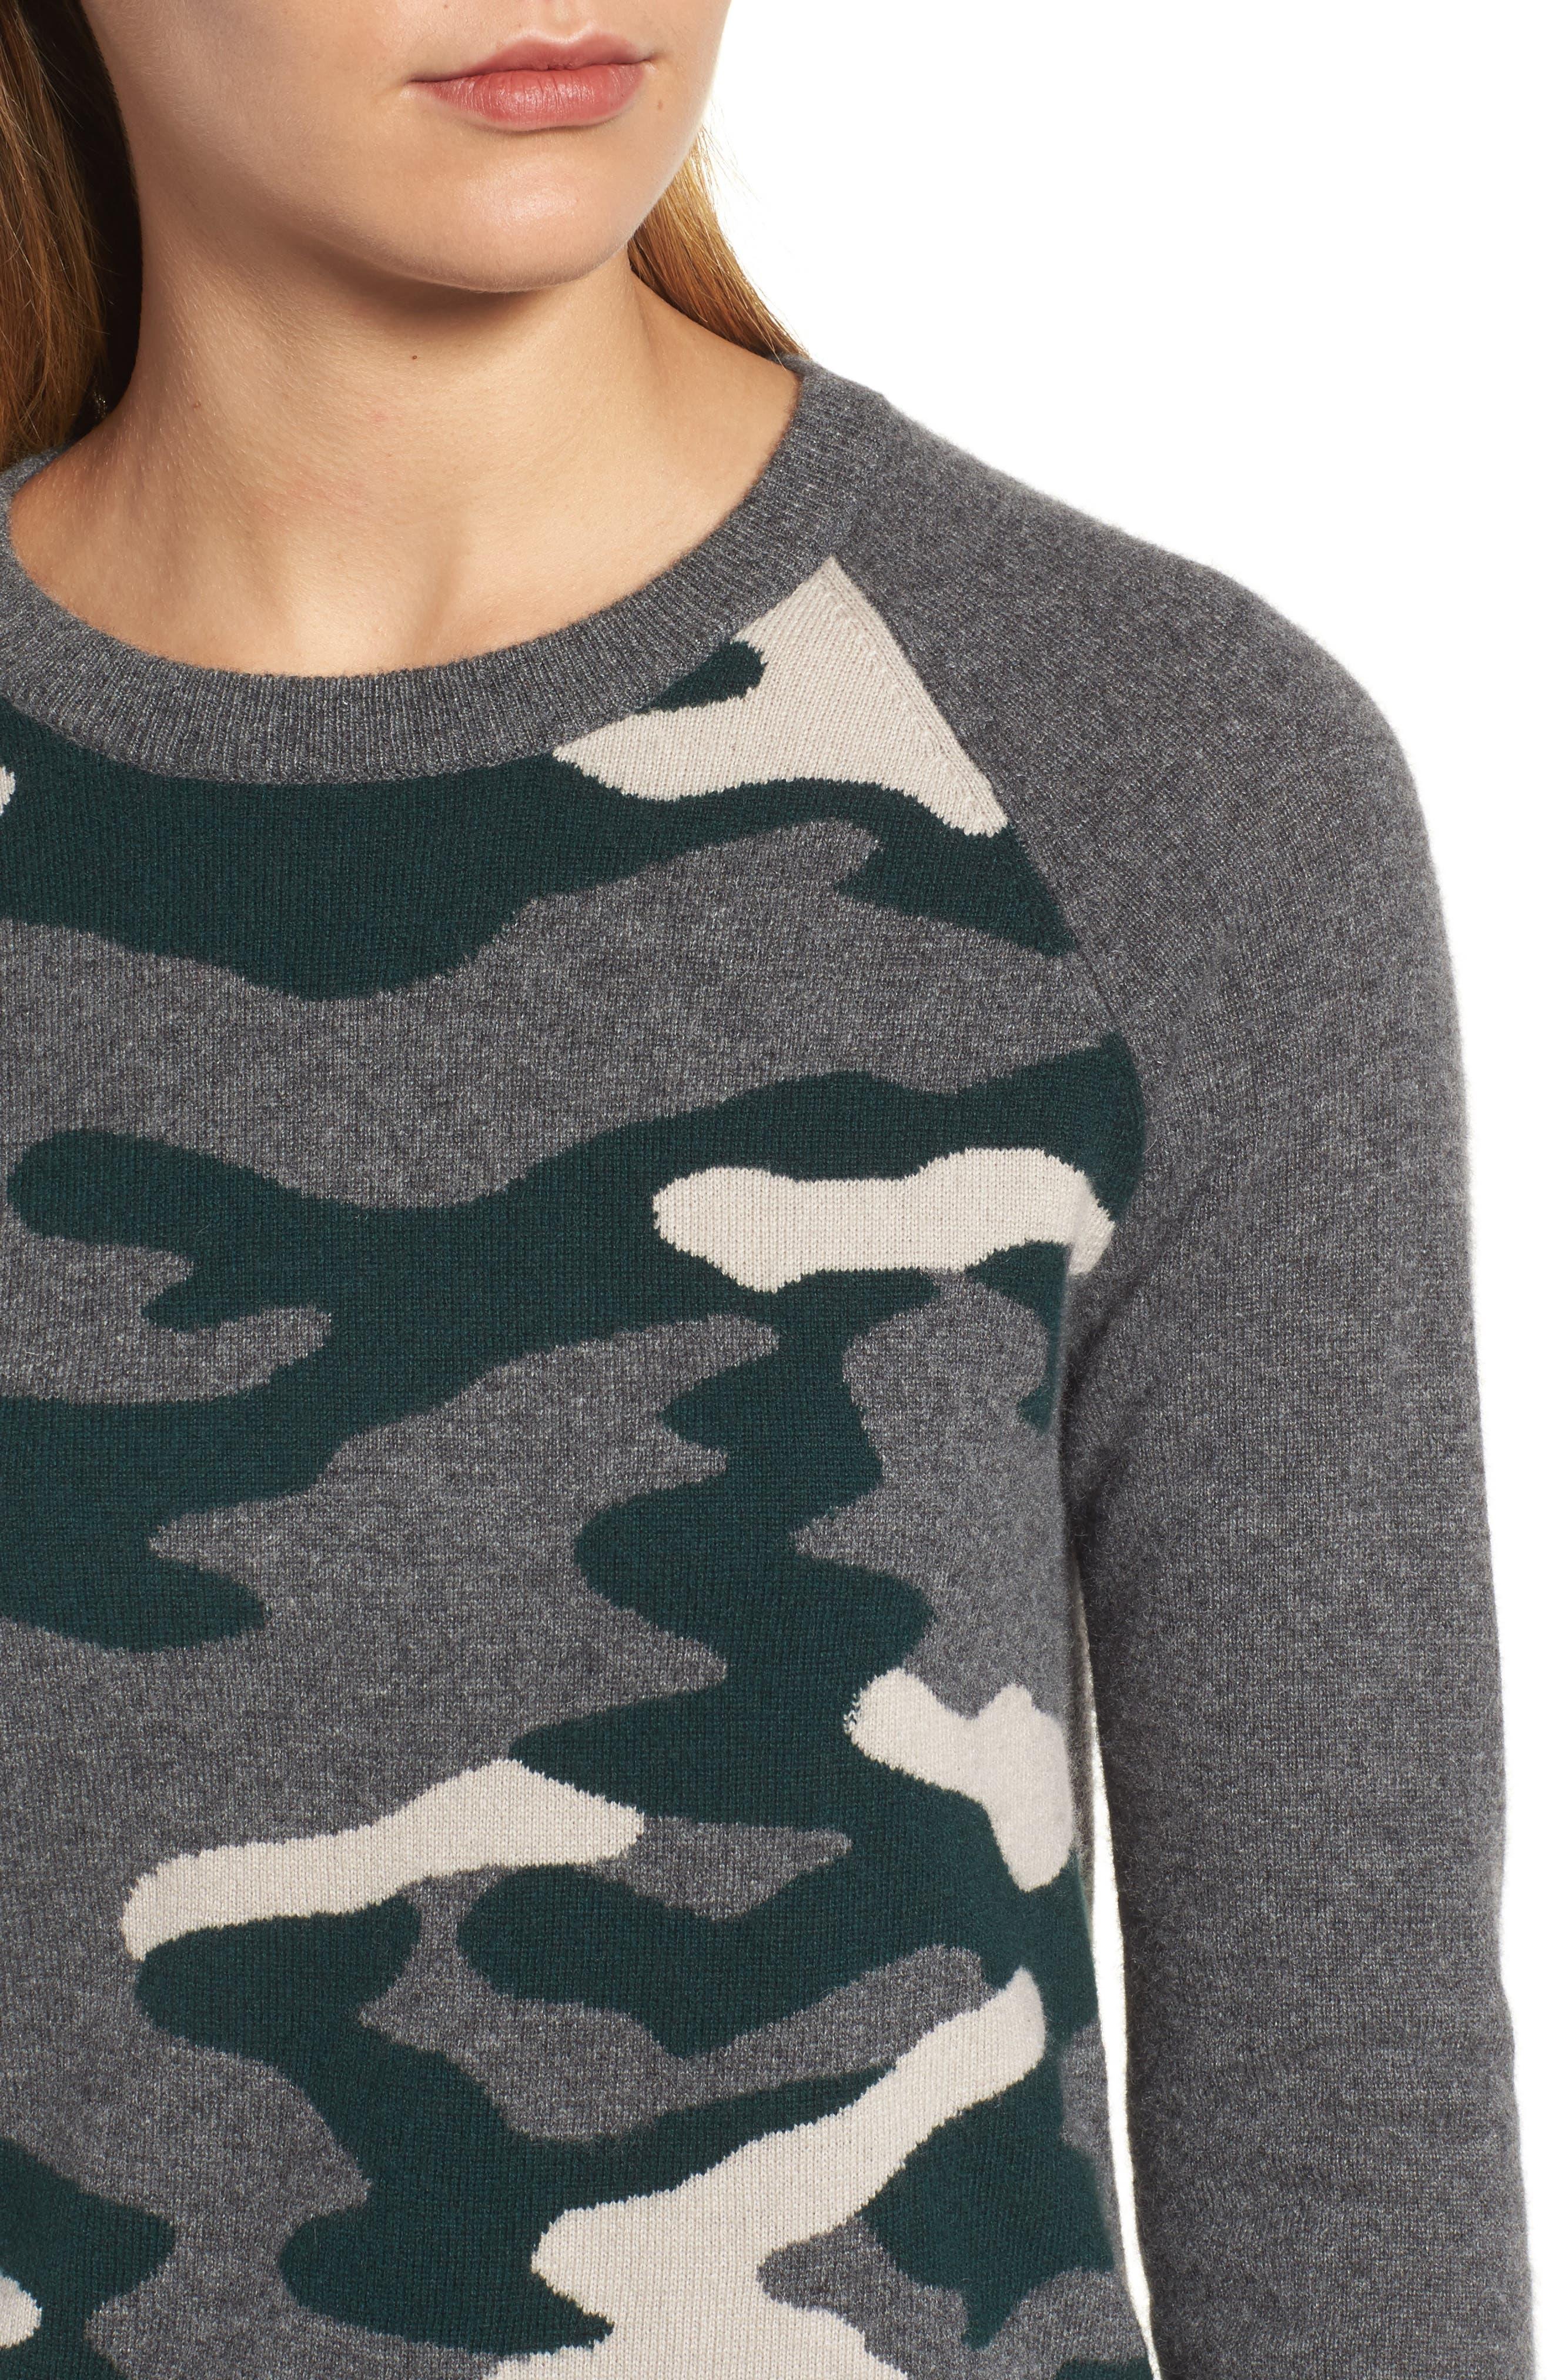 Camo Cashmere Sweater,                             Alternate thumbnail 4, color,